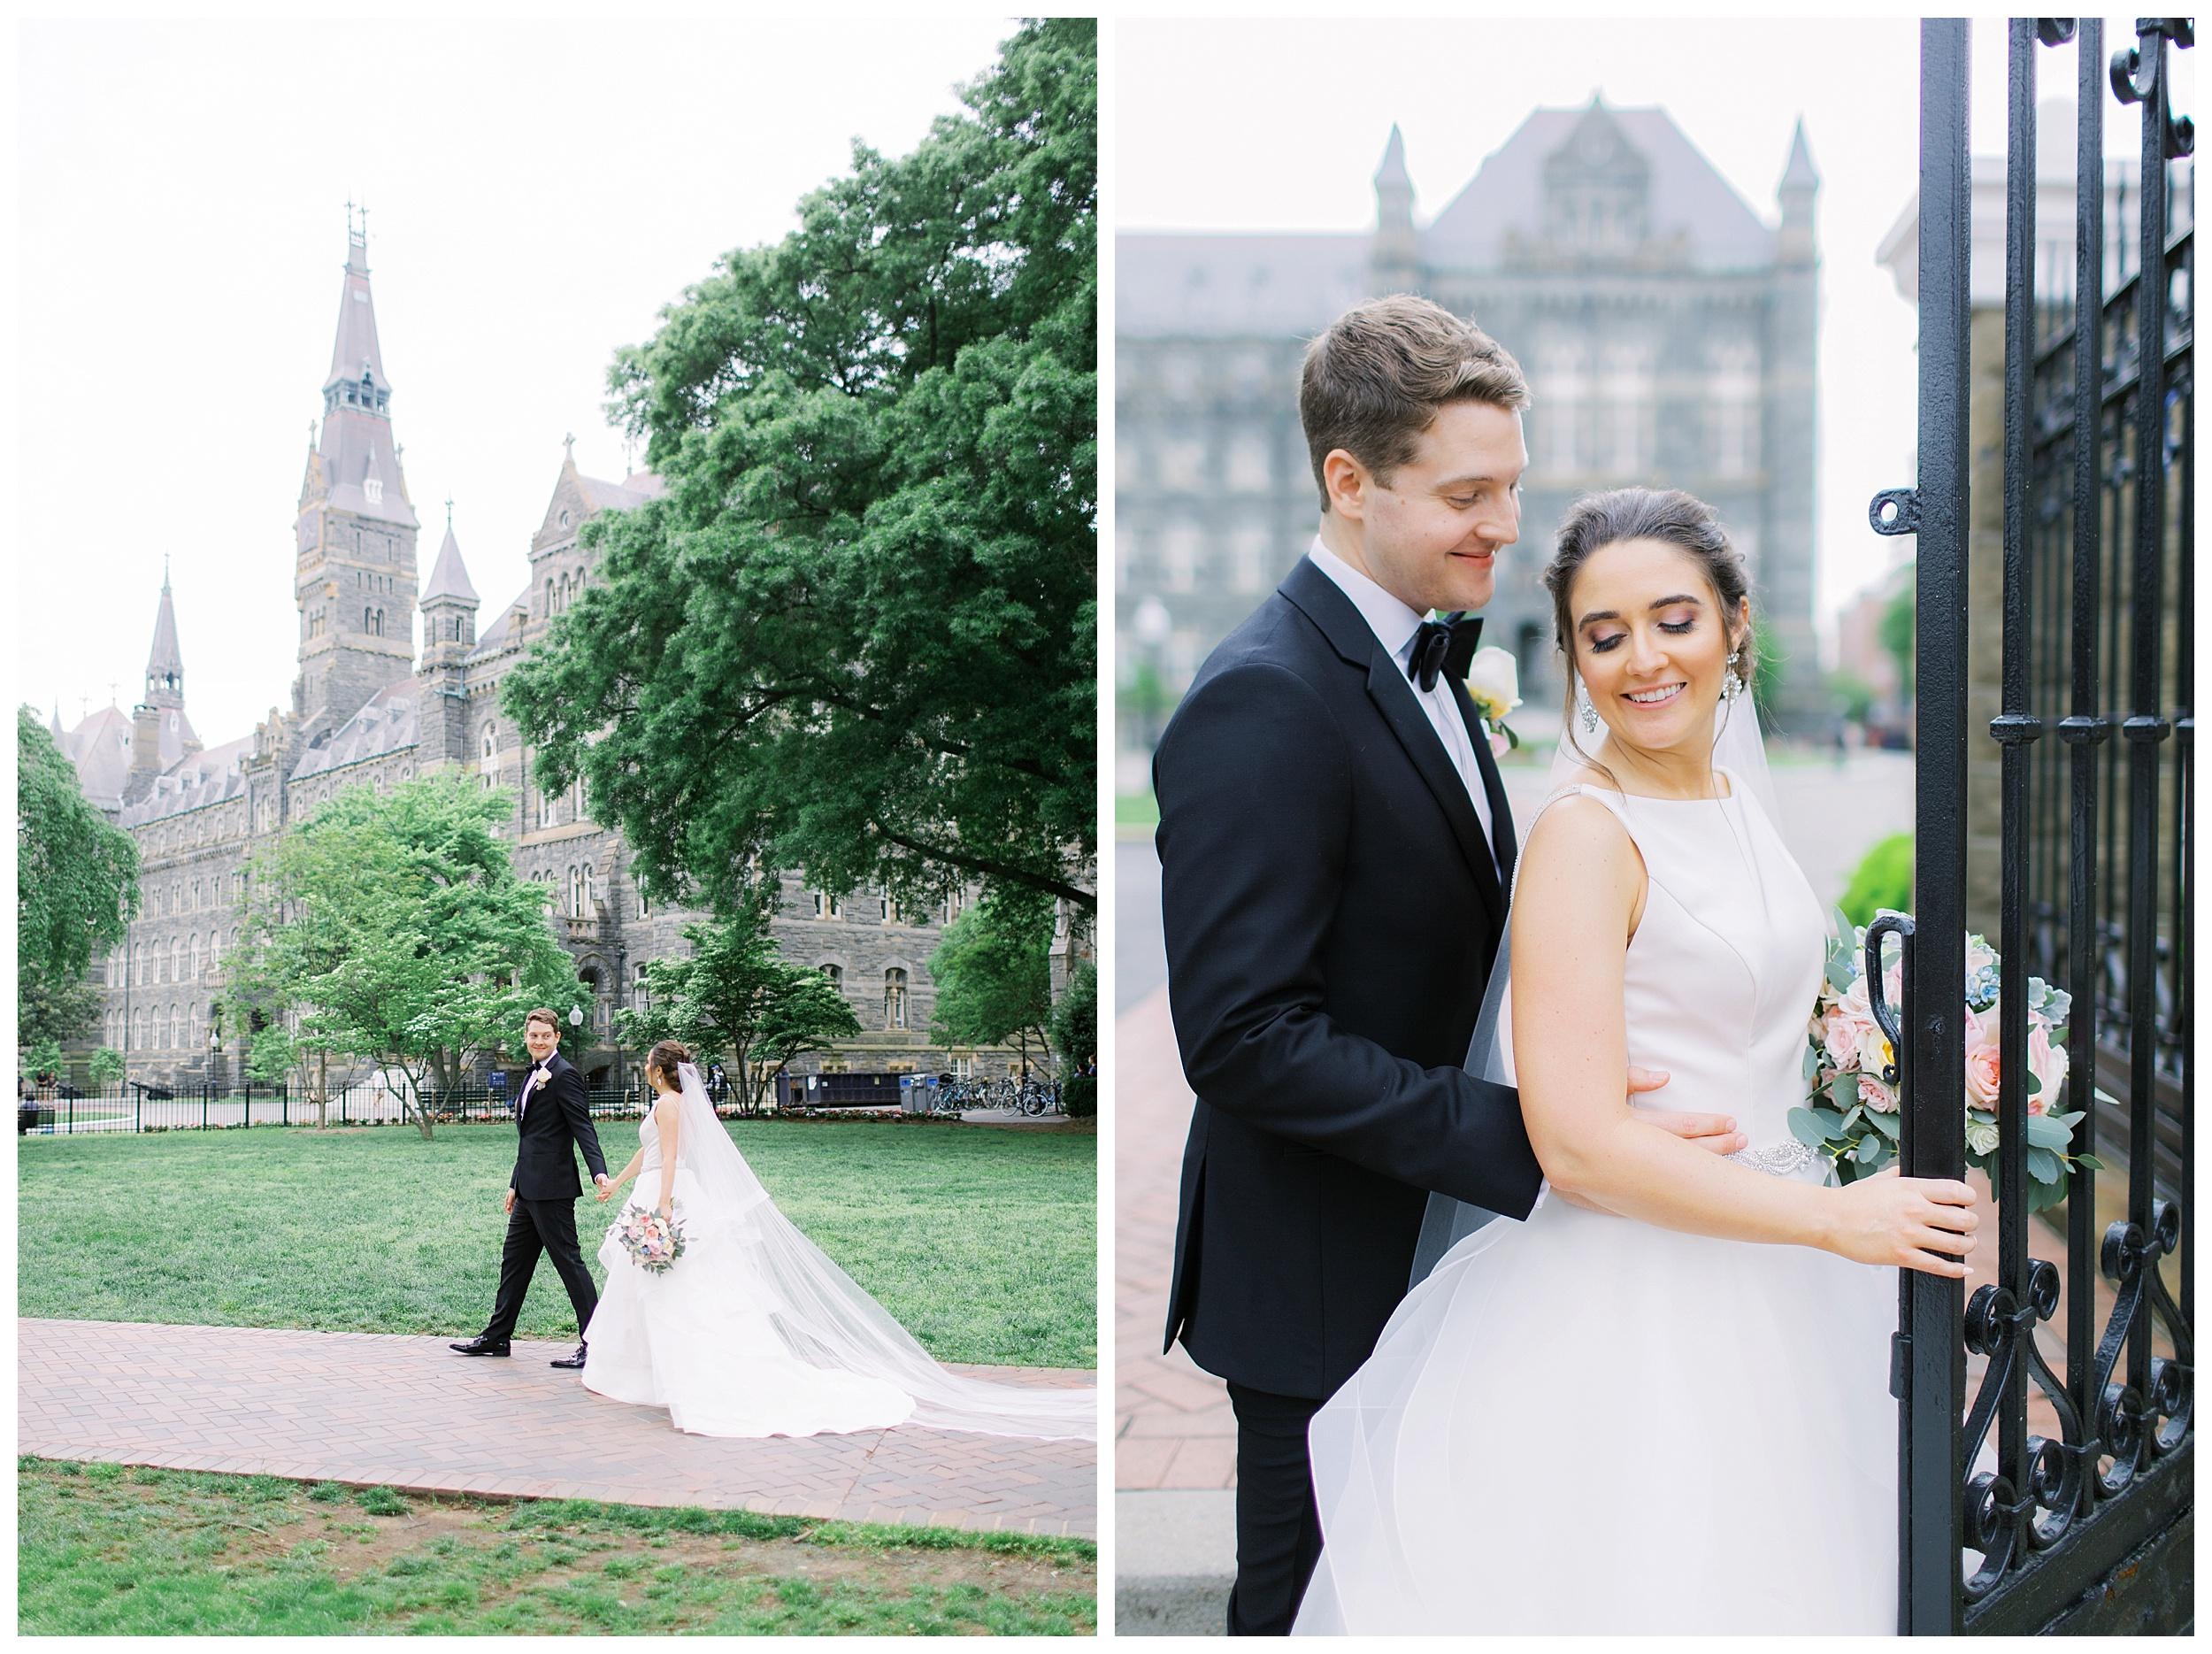 DAR Constitution Hall Wedding Wedding | Daughters of the American Revolution Wedding | District of Columbia Film Wedding Photographer Kir Tuben_0071.jpg